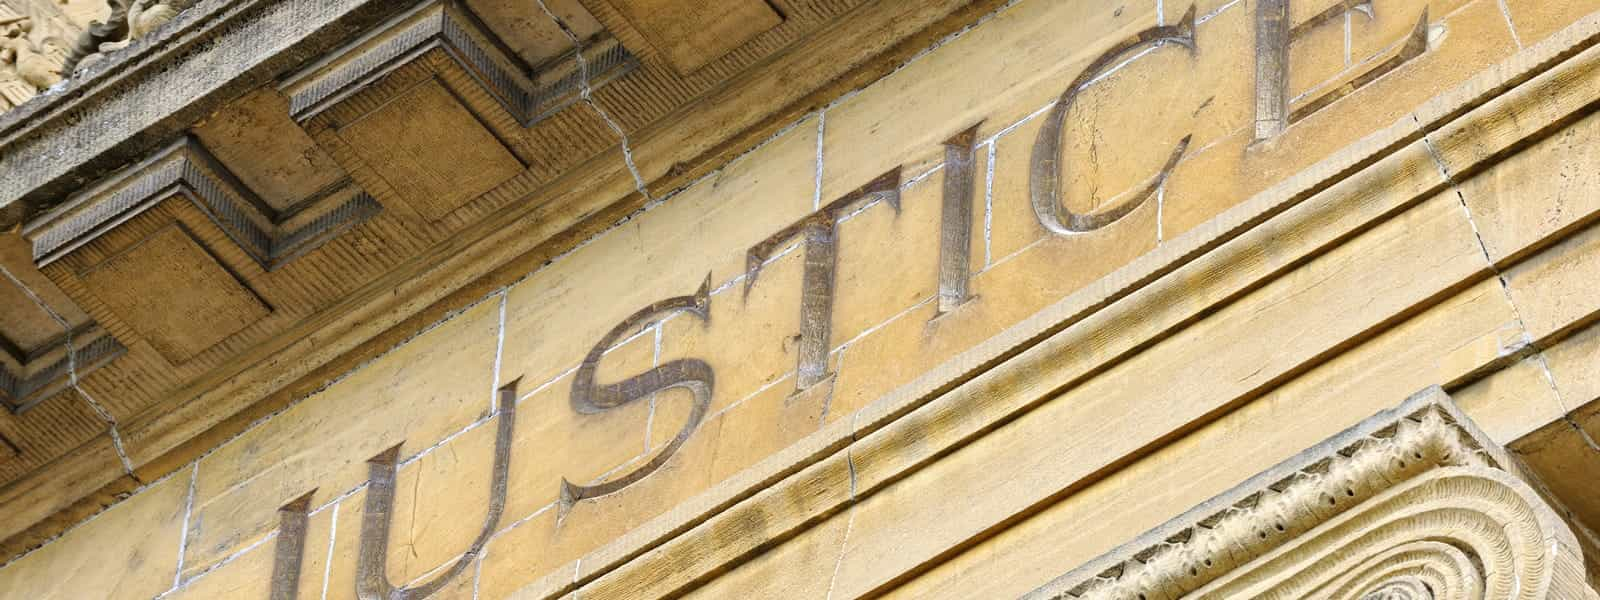 Law School University Of Strathclyde